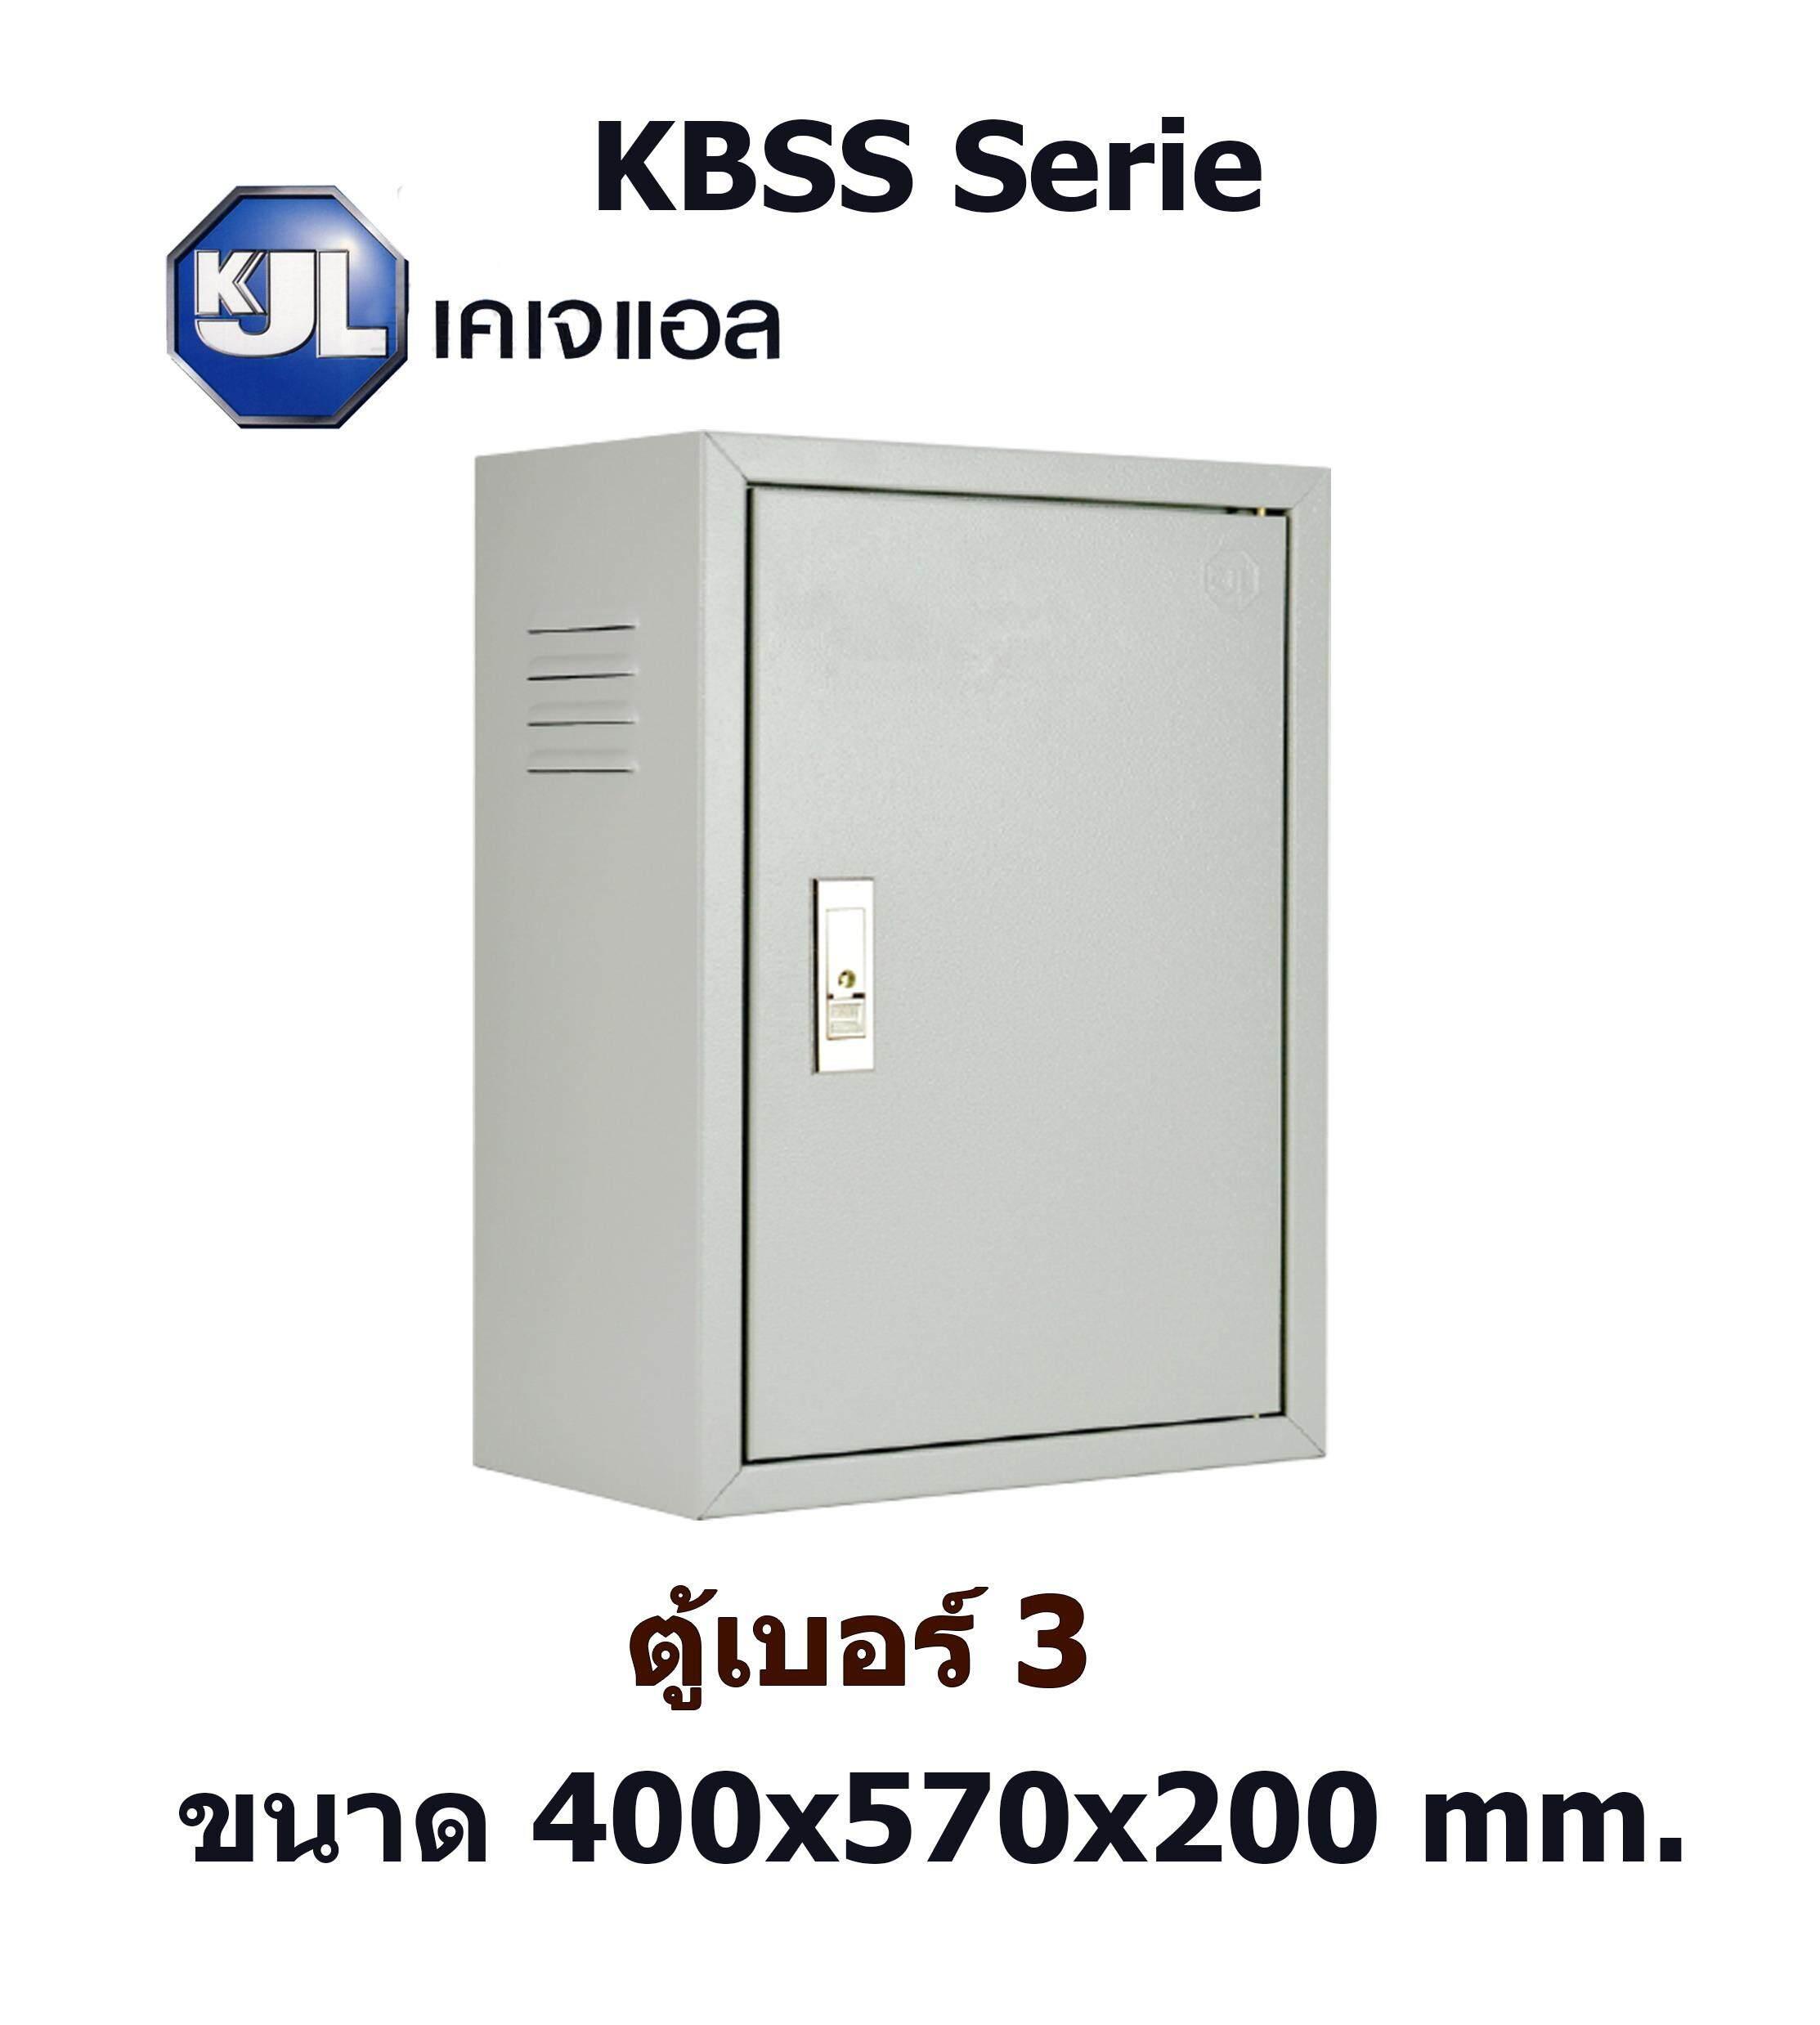 KJL ตู้เหล็กสวิทช์บอร์ดไซส์มาตรฐานแบบธรรมดา เบอร์ 3 ขนาด 400x570x200 mm.